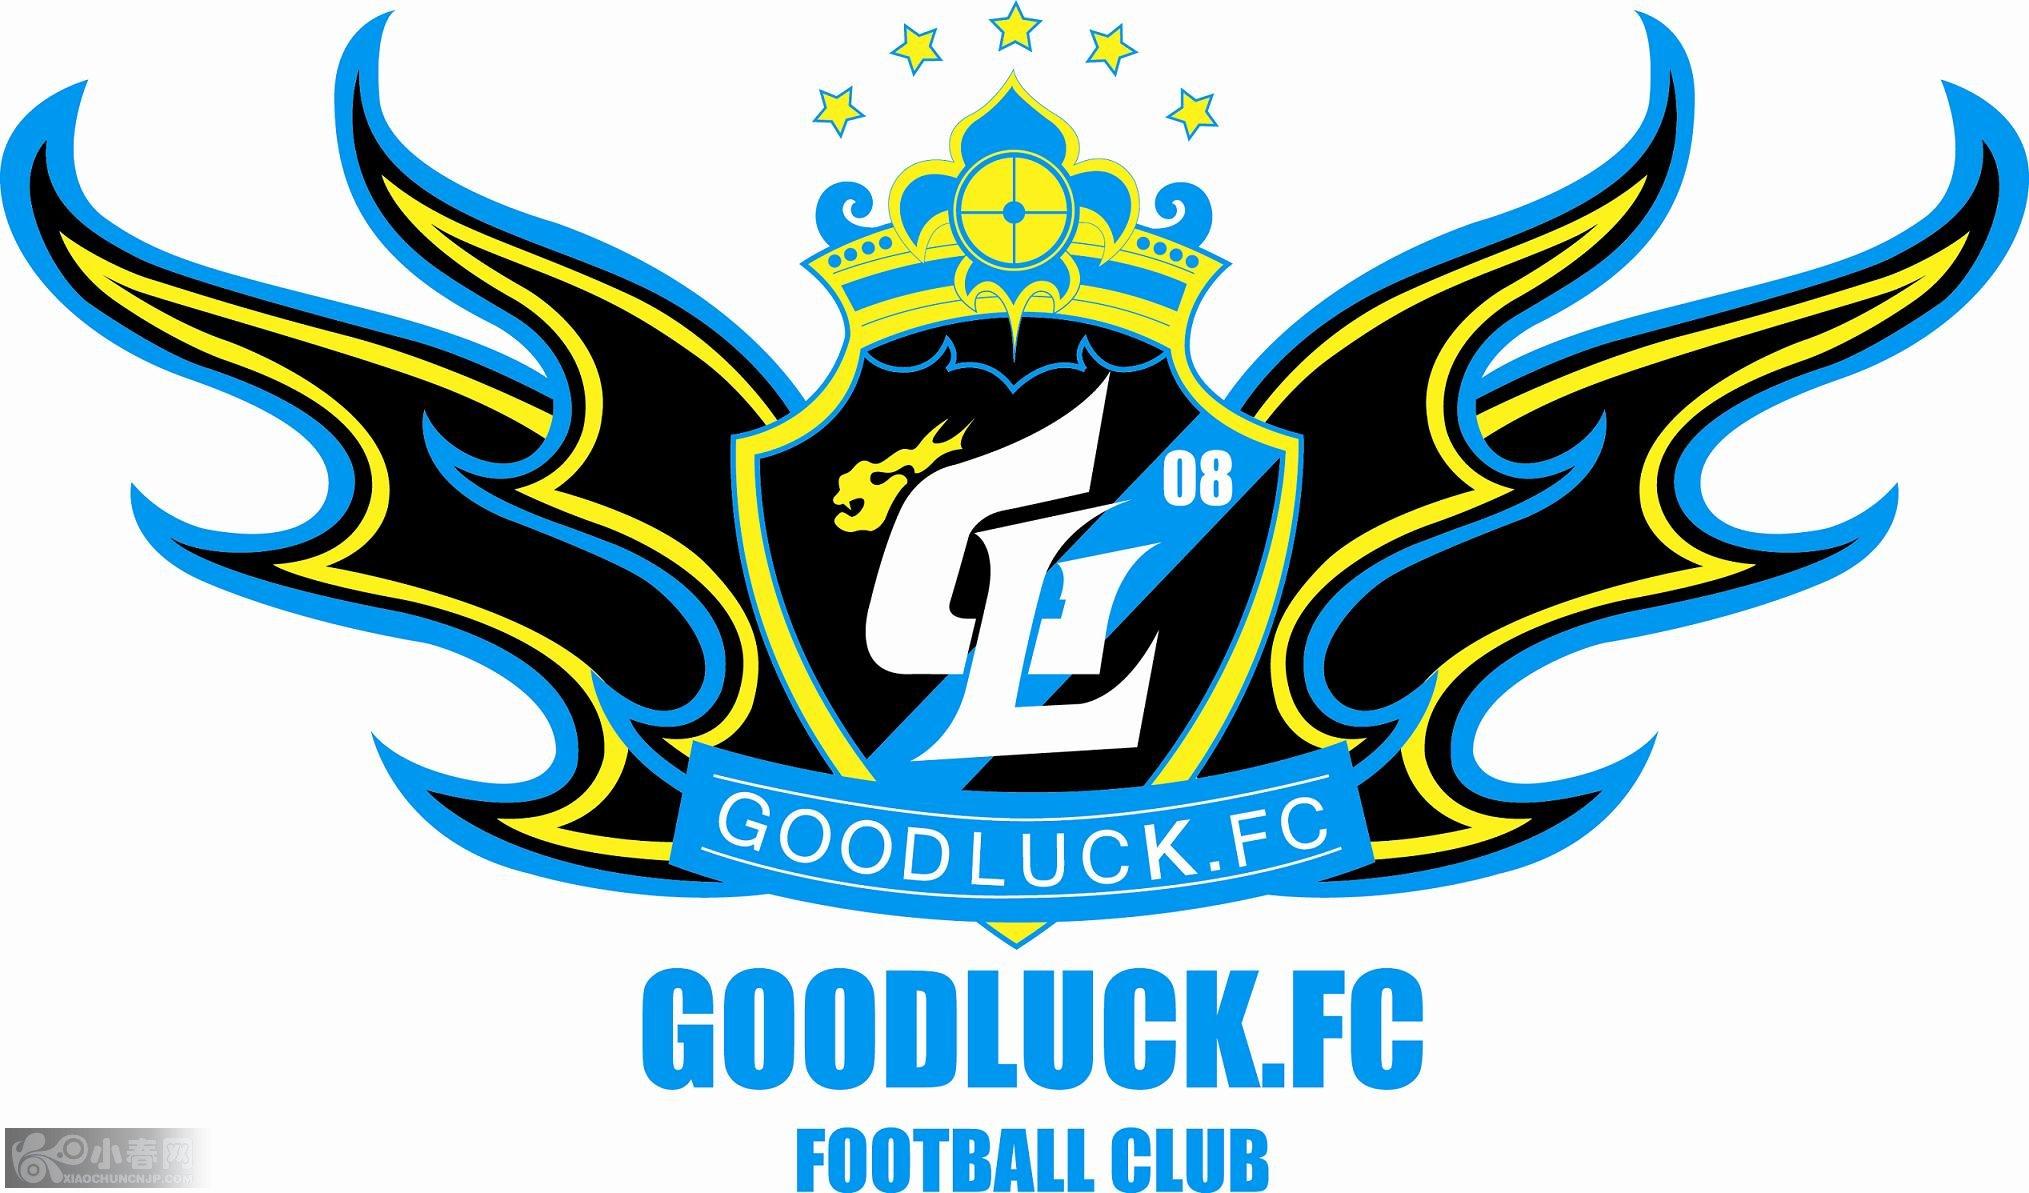 goodluck濸焹.ai11.jpg